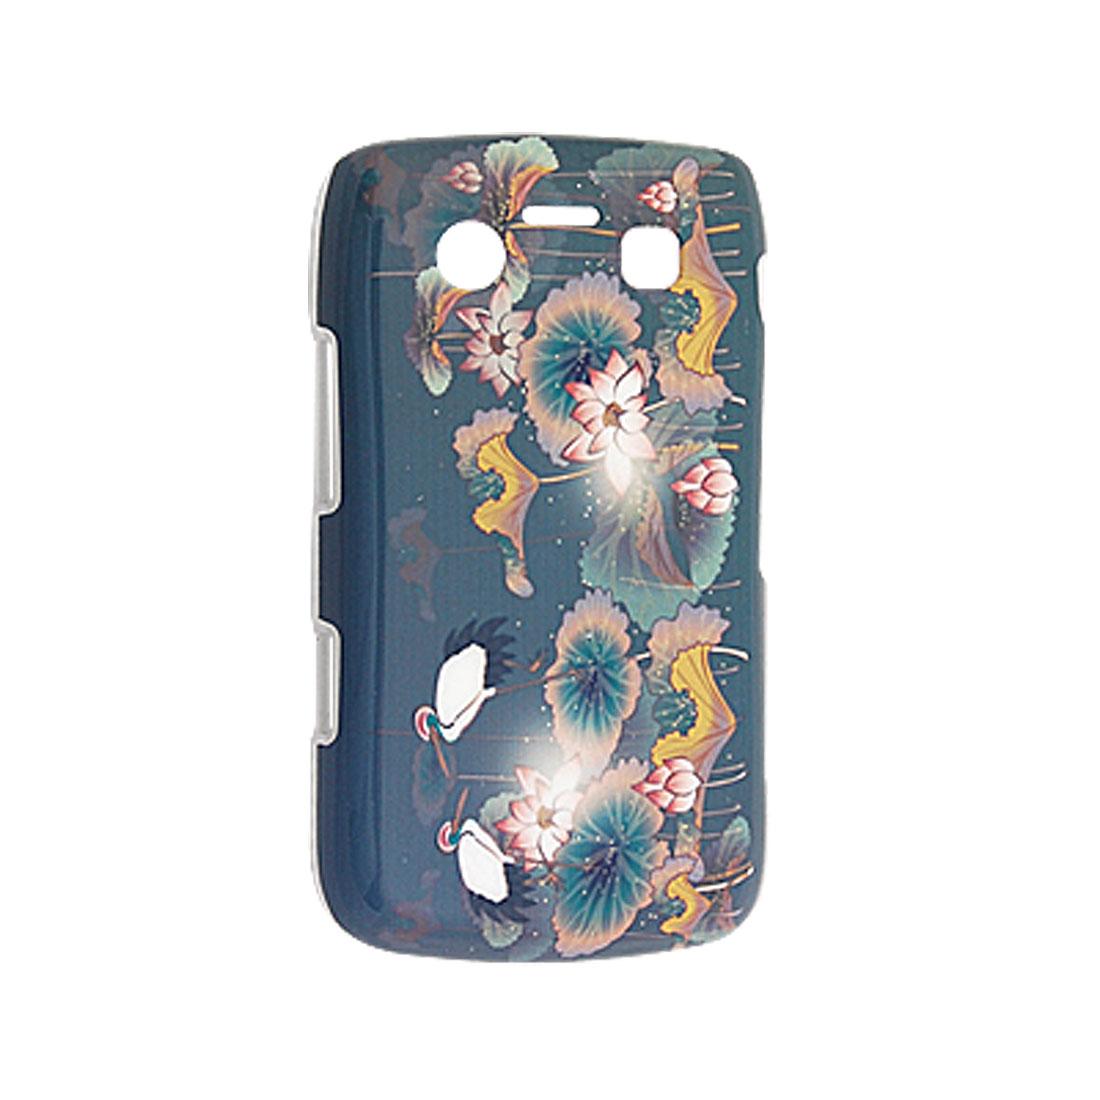 Crane in Lotus Pool Painting Plastic Back Case for Blackberry 9700